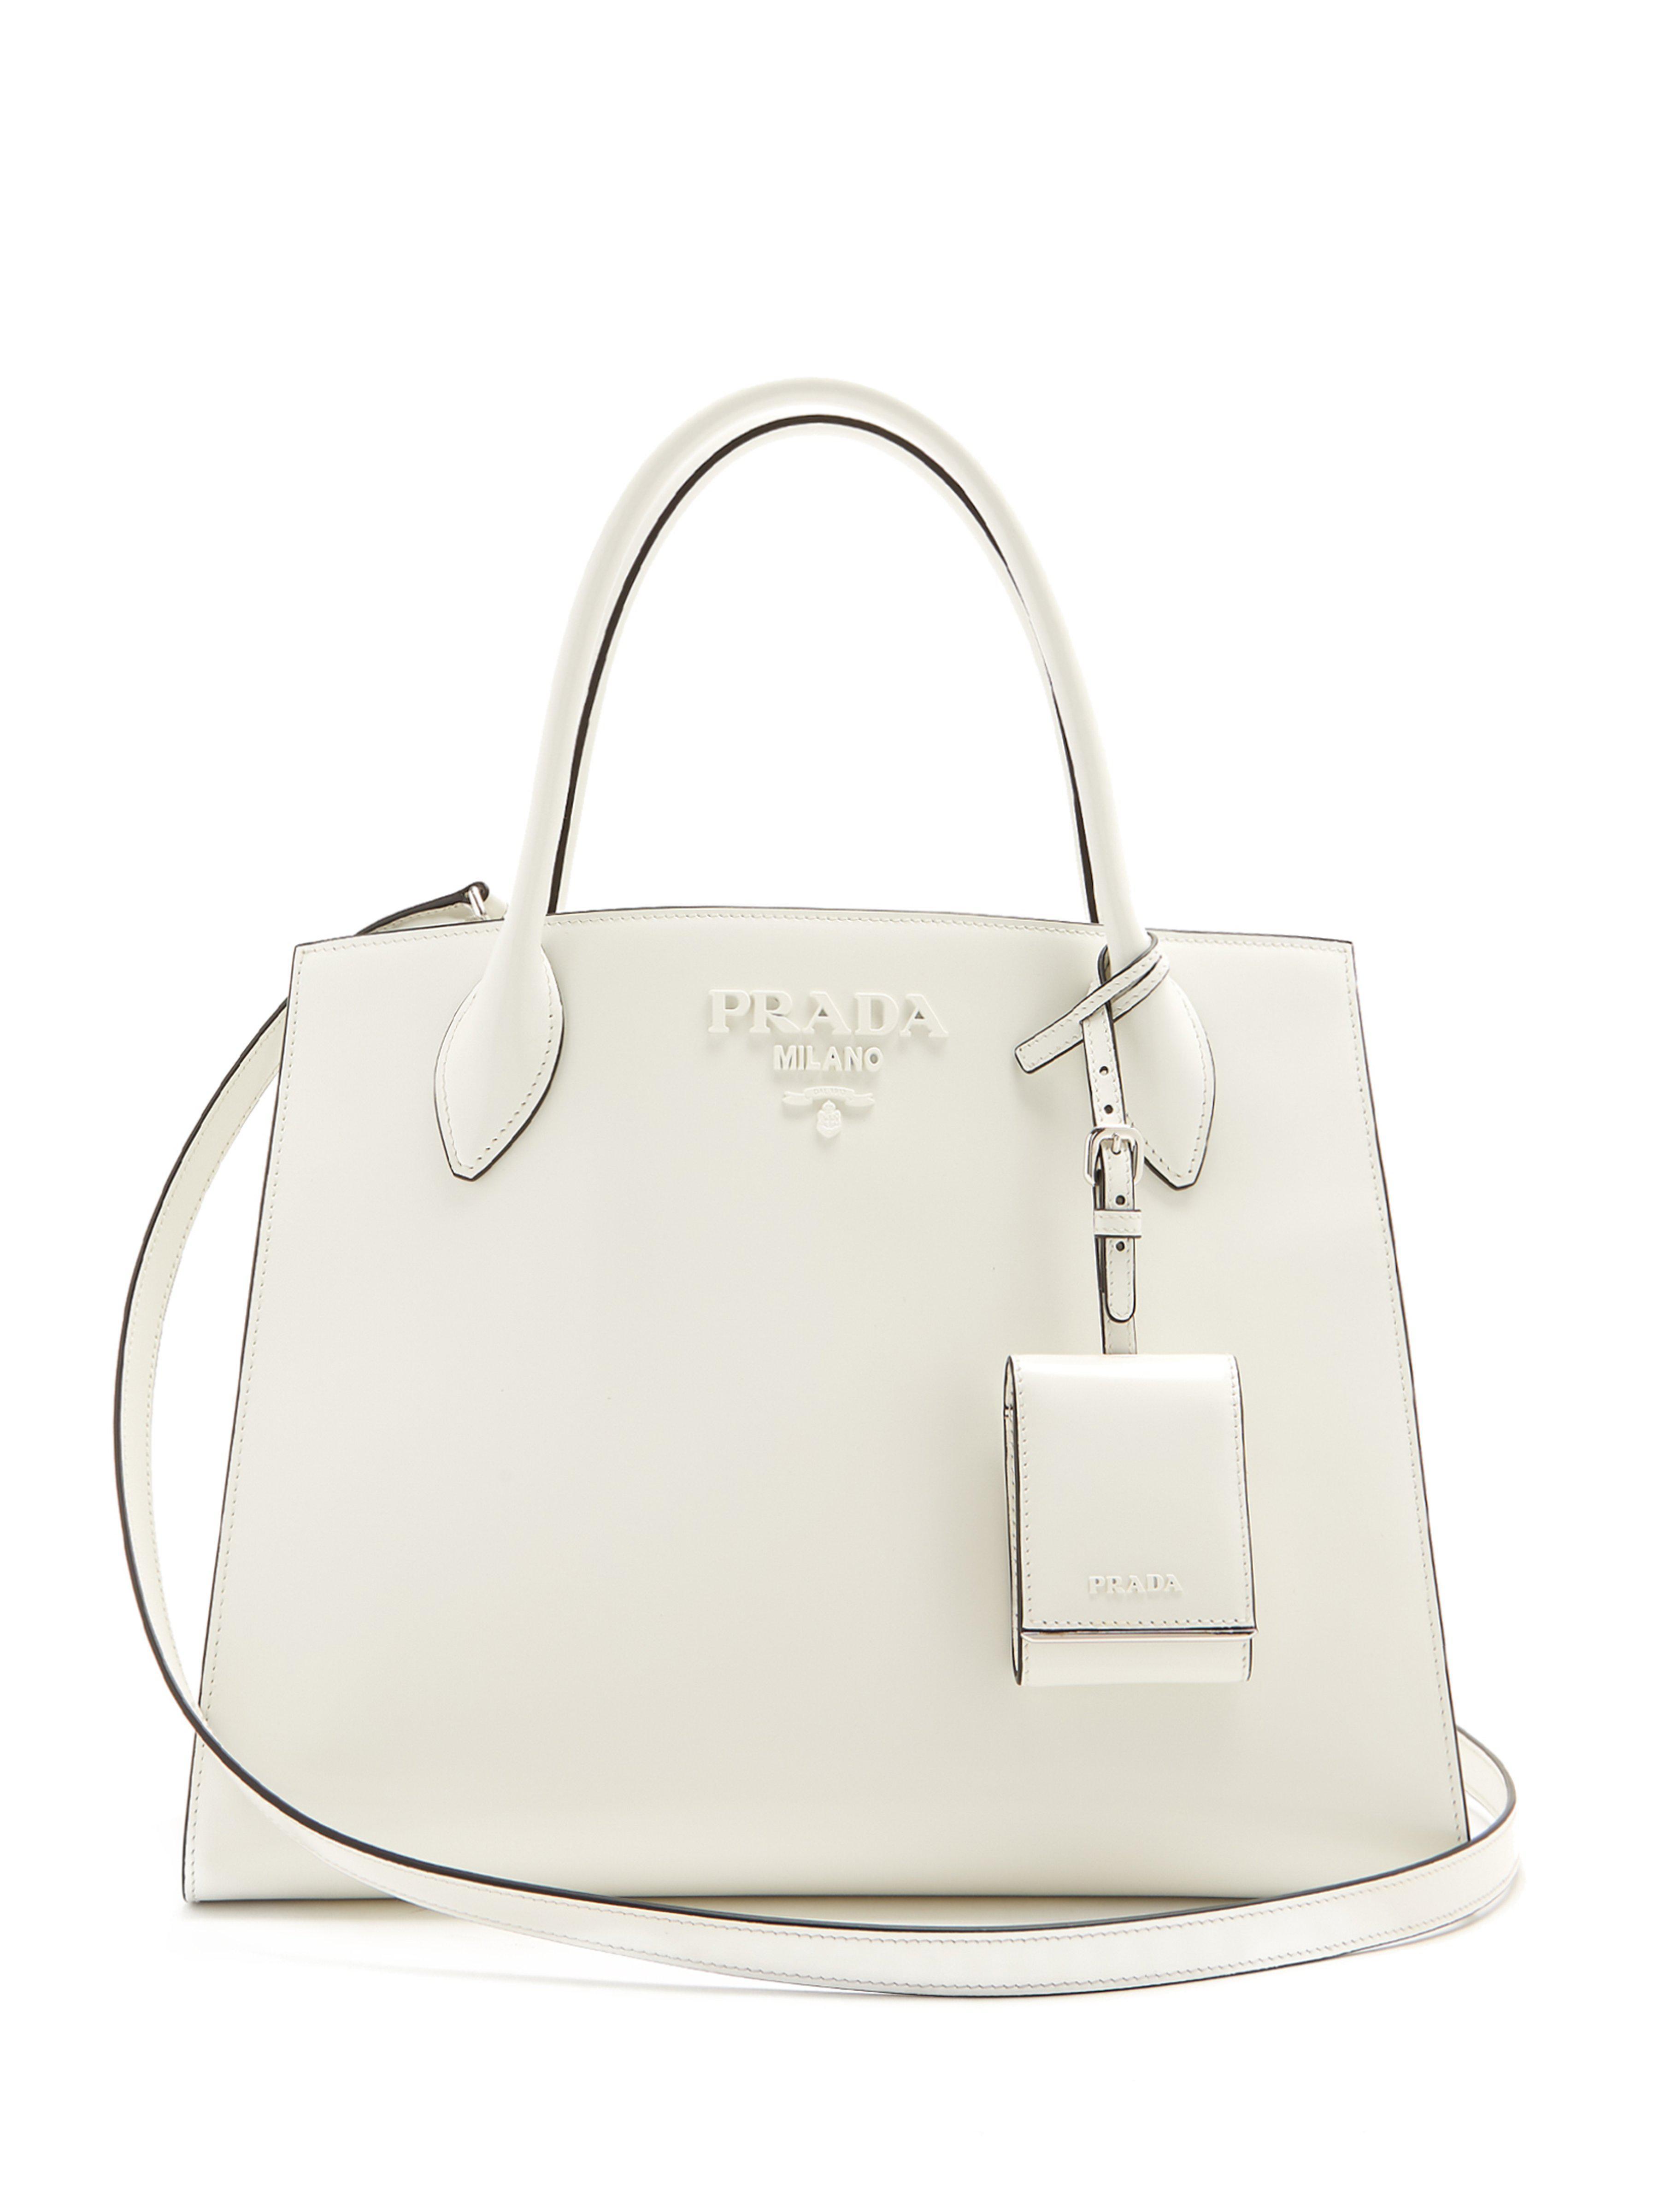 6fef026bc25b Prada Monochrome Medium Leather Bag in White - Lyst